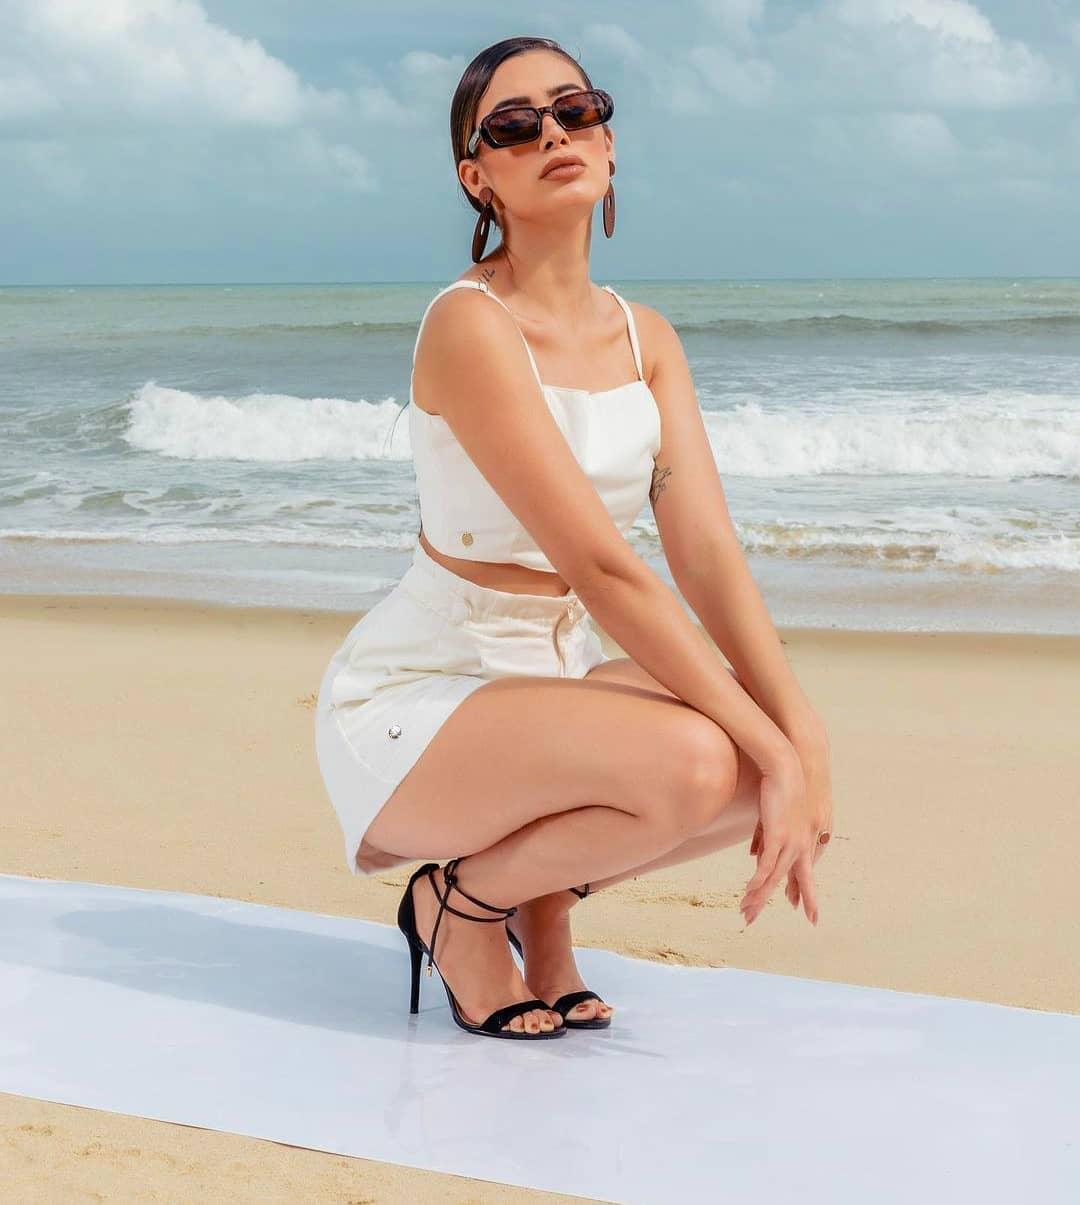 natalia gurgel, top model brasil 2021/miss morada nova 2019/miss sertao central empresarial 2018/top 20 de miss asia pacific international 2018, representando o uruguai. - Página 5 21373210